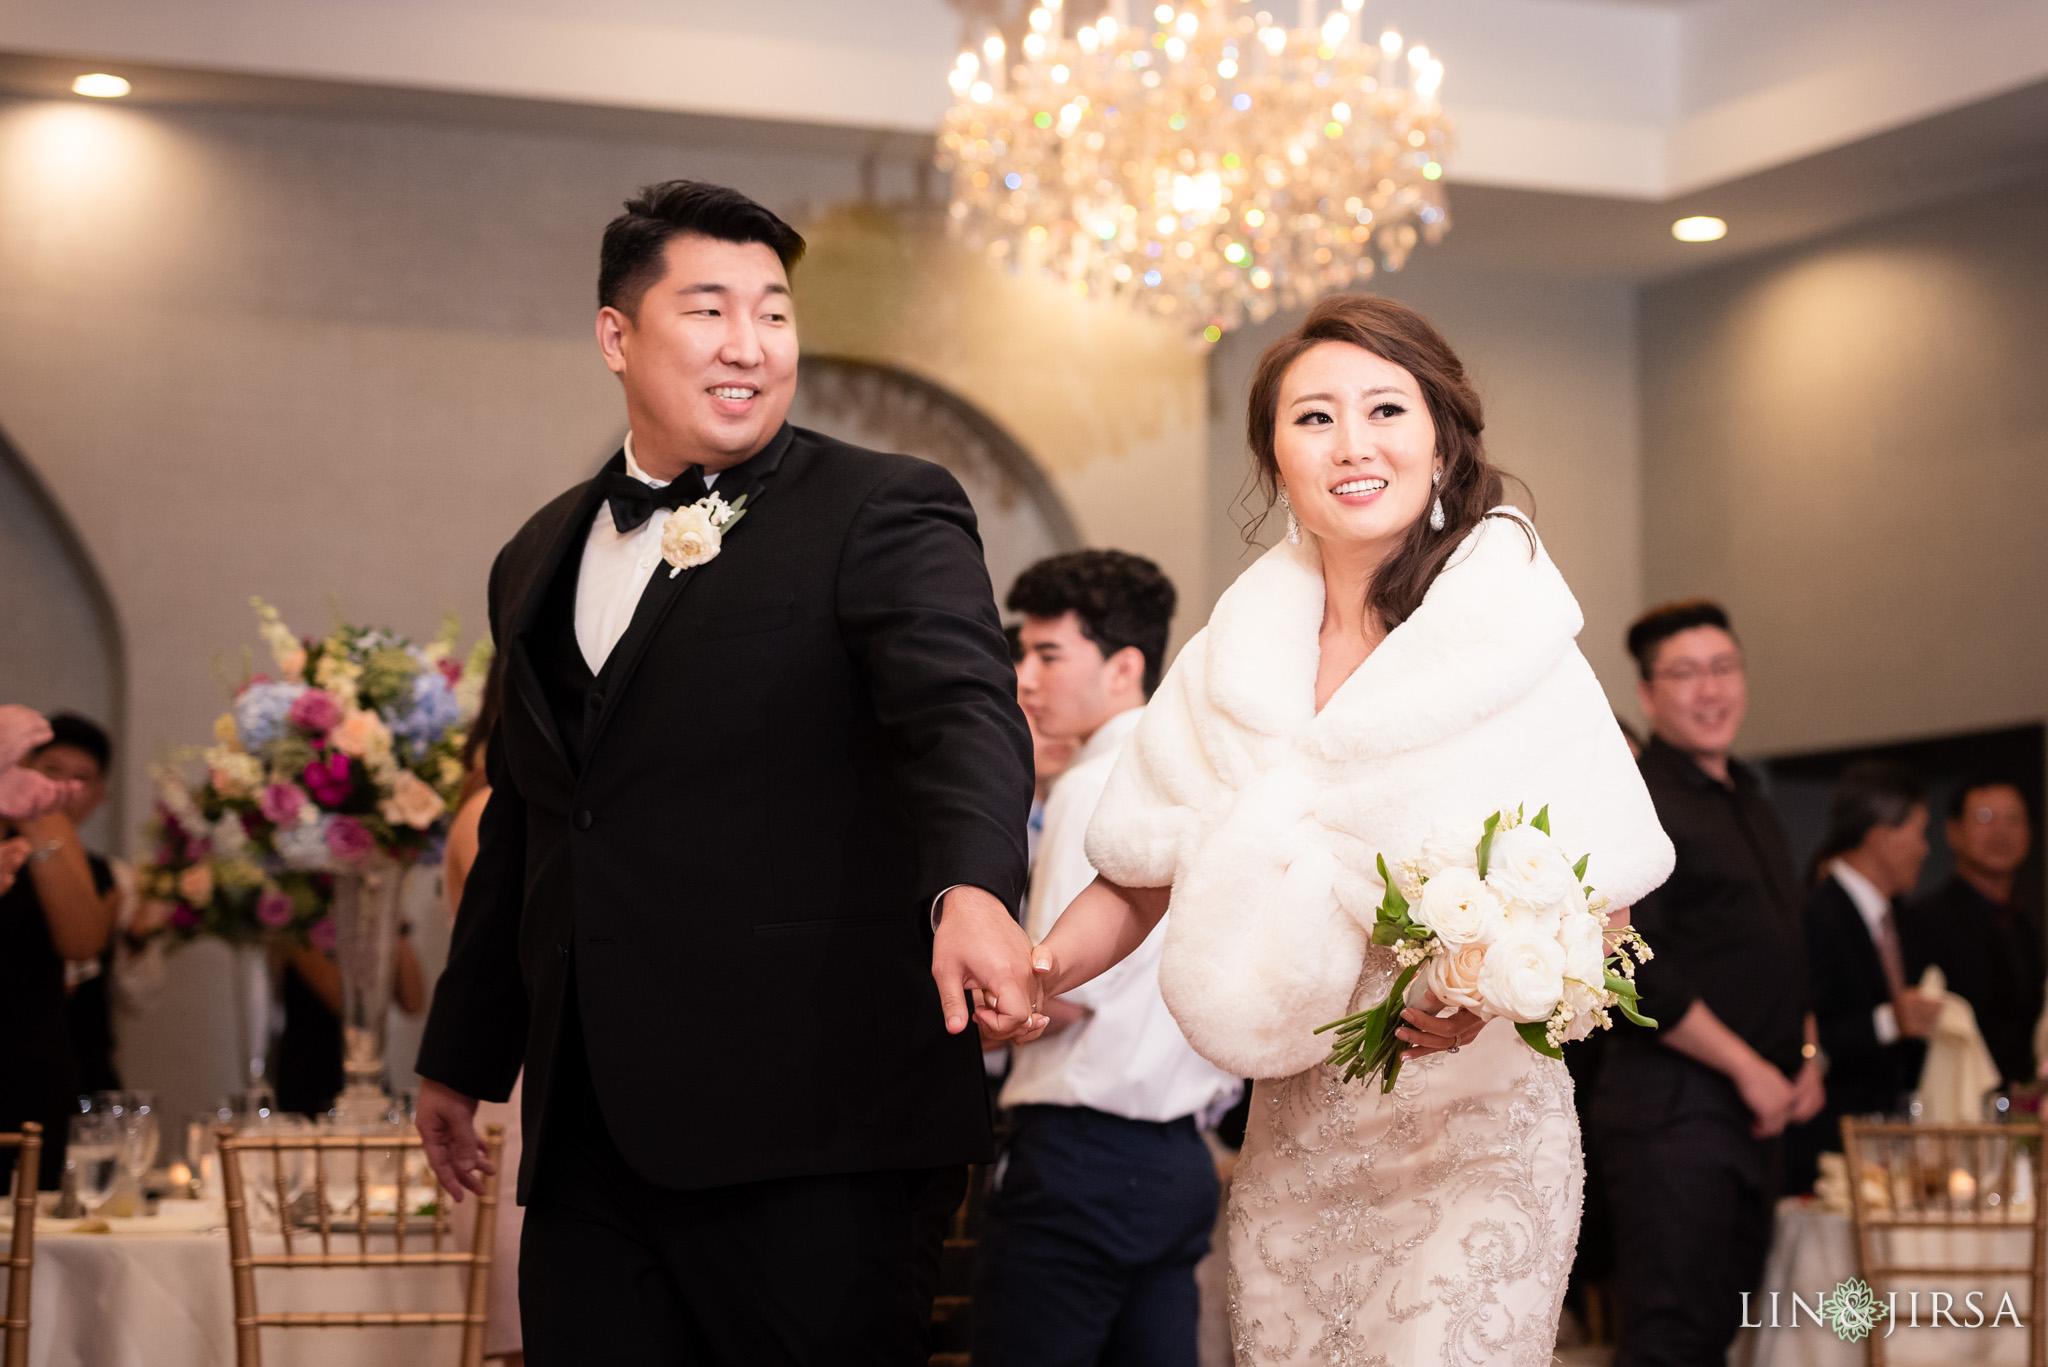 28 trump national golf club rancho palos verdes wedding reception photography